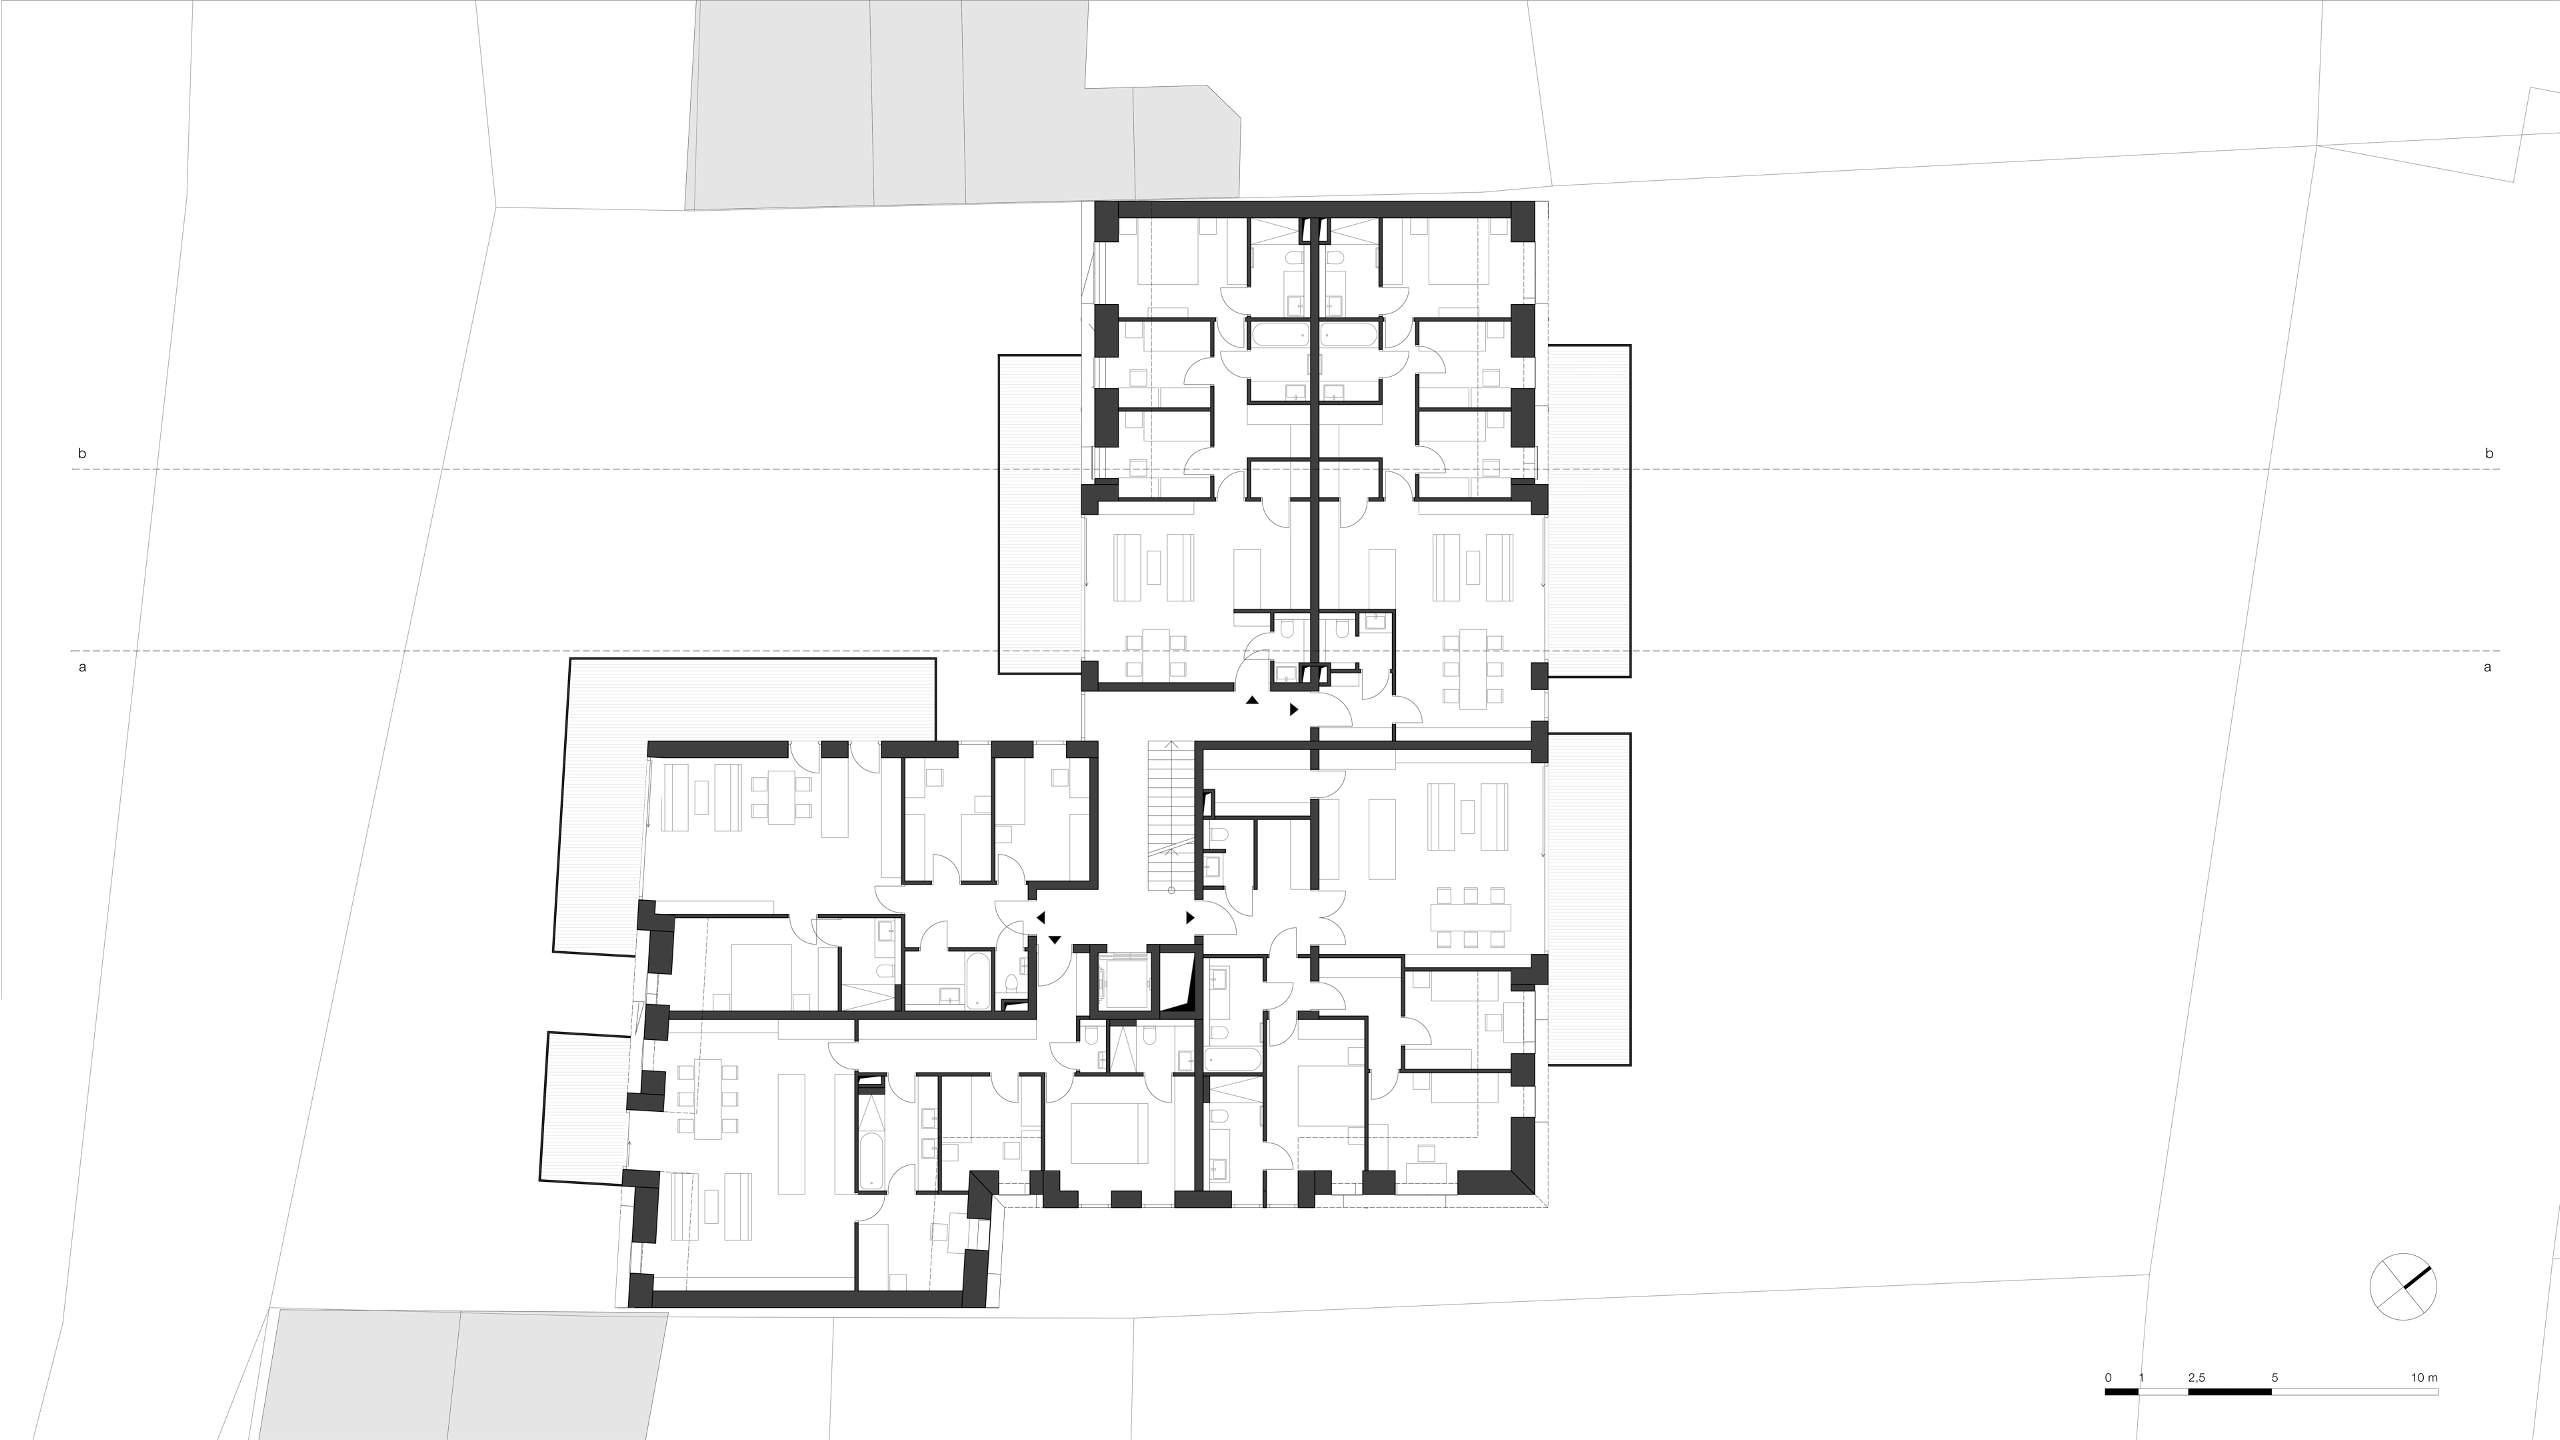 LIEGLER TAKEH ARCHITEKTEN Projekt Gersthoferstraße Plan